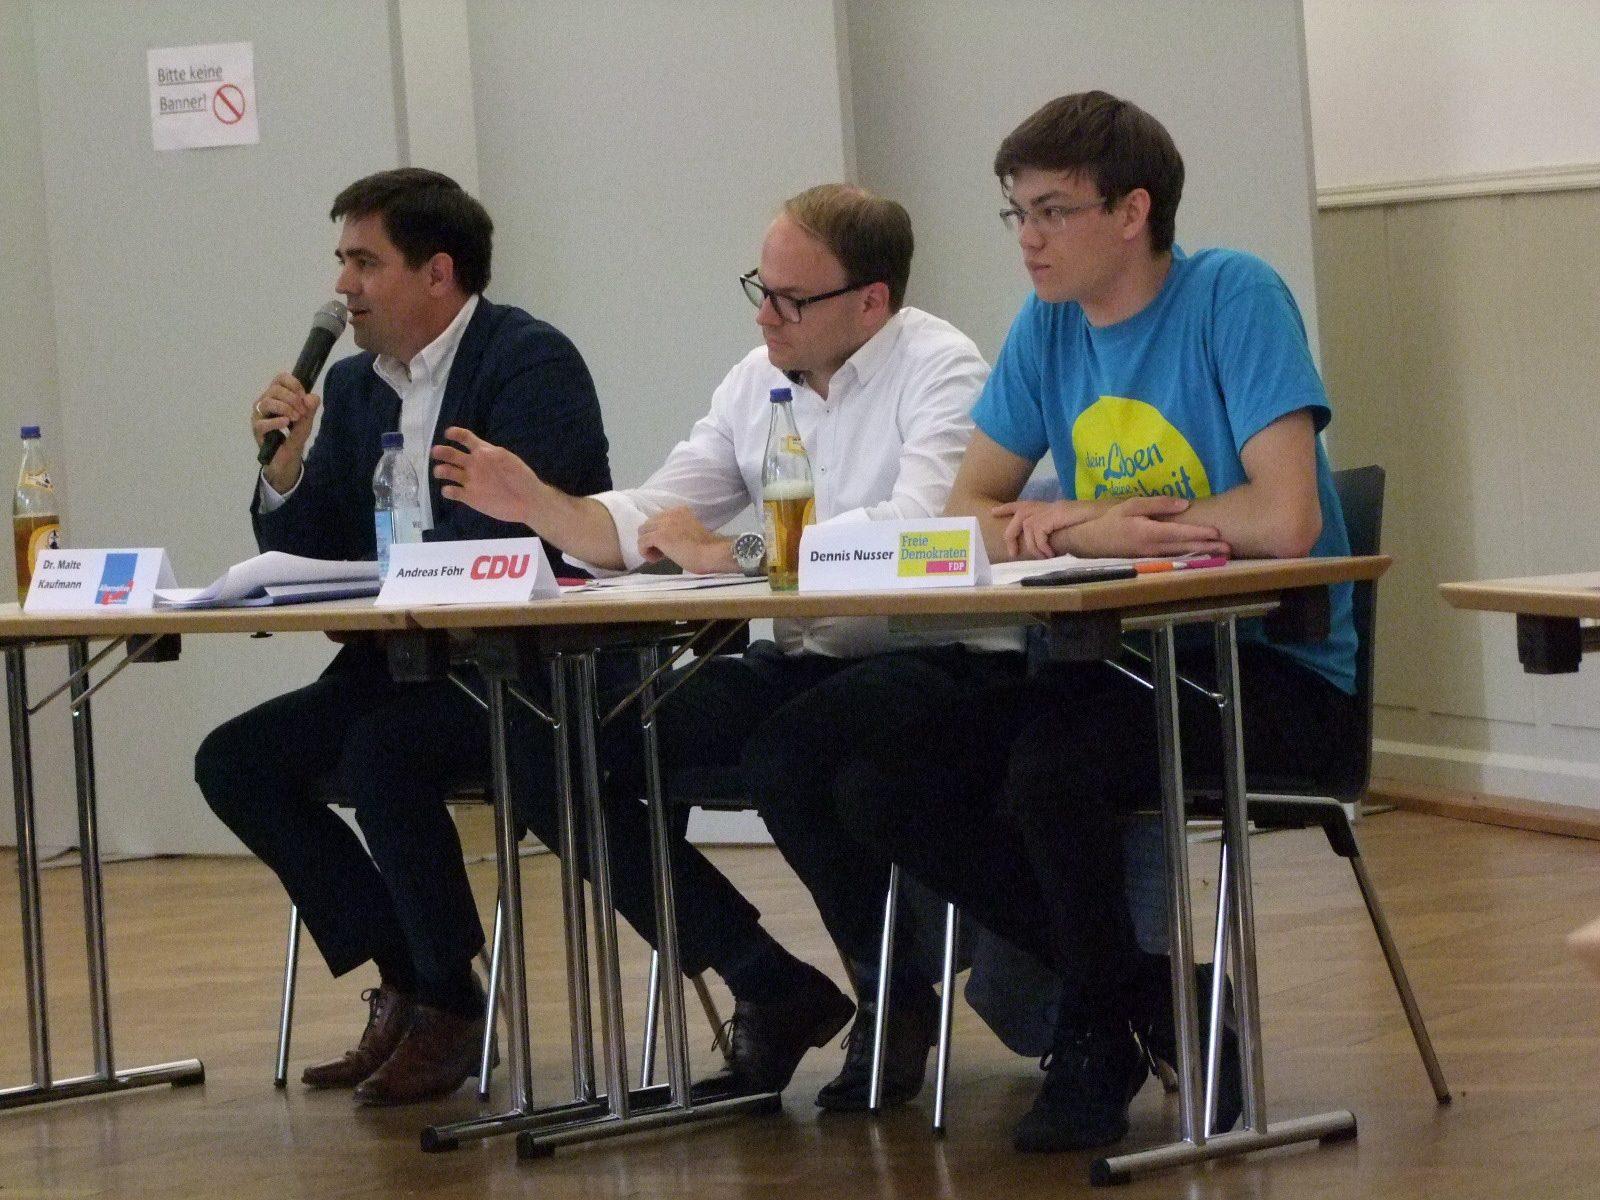 Podiumsdiskussion PH AfD CDU FDP